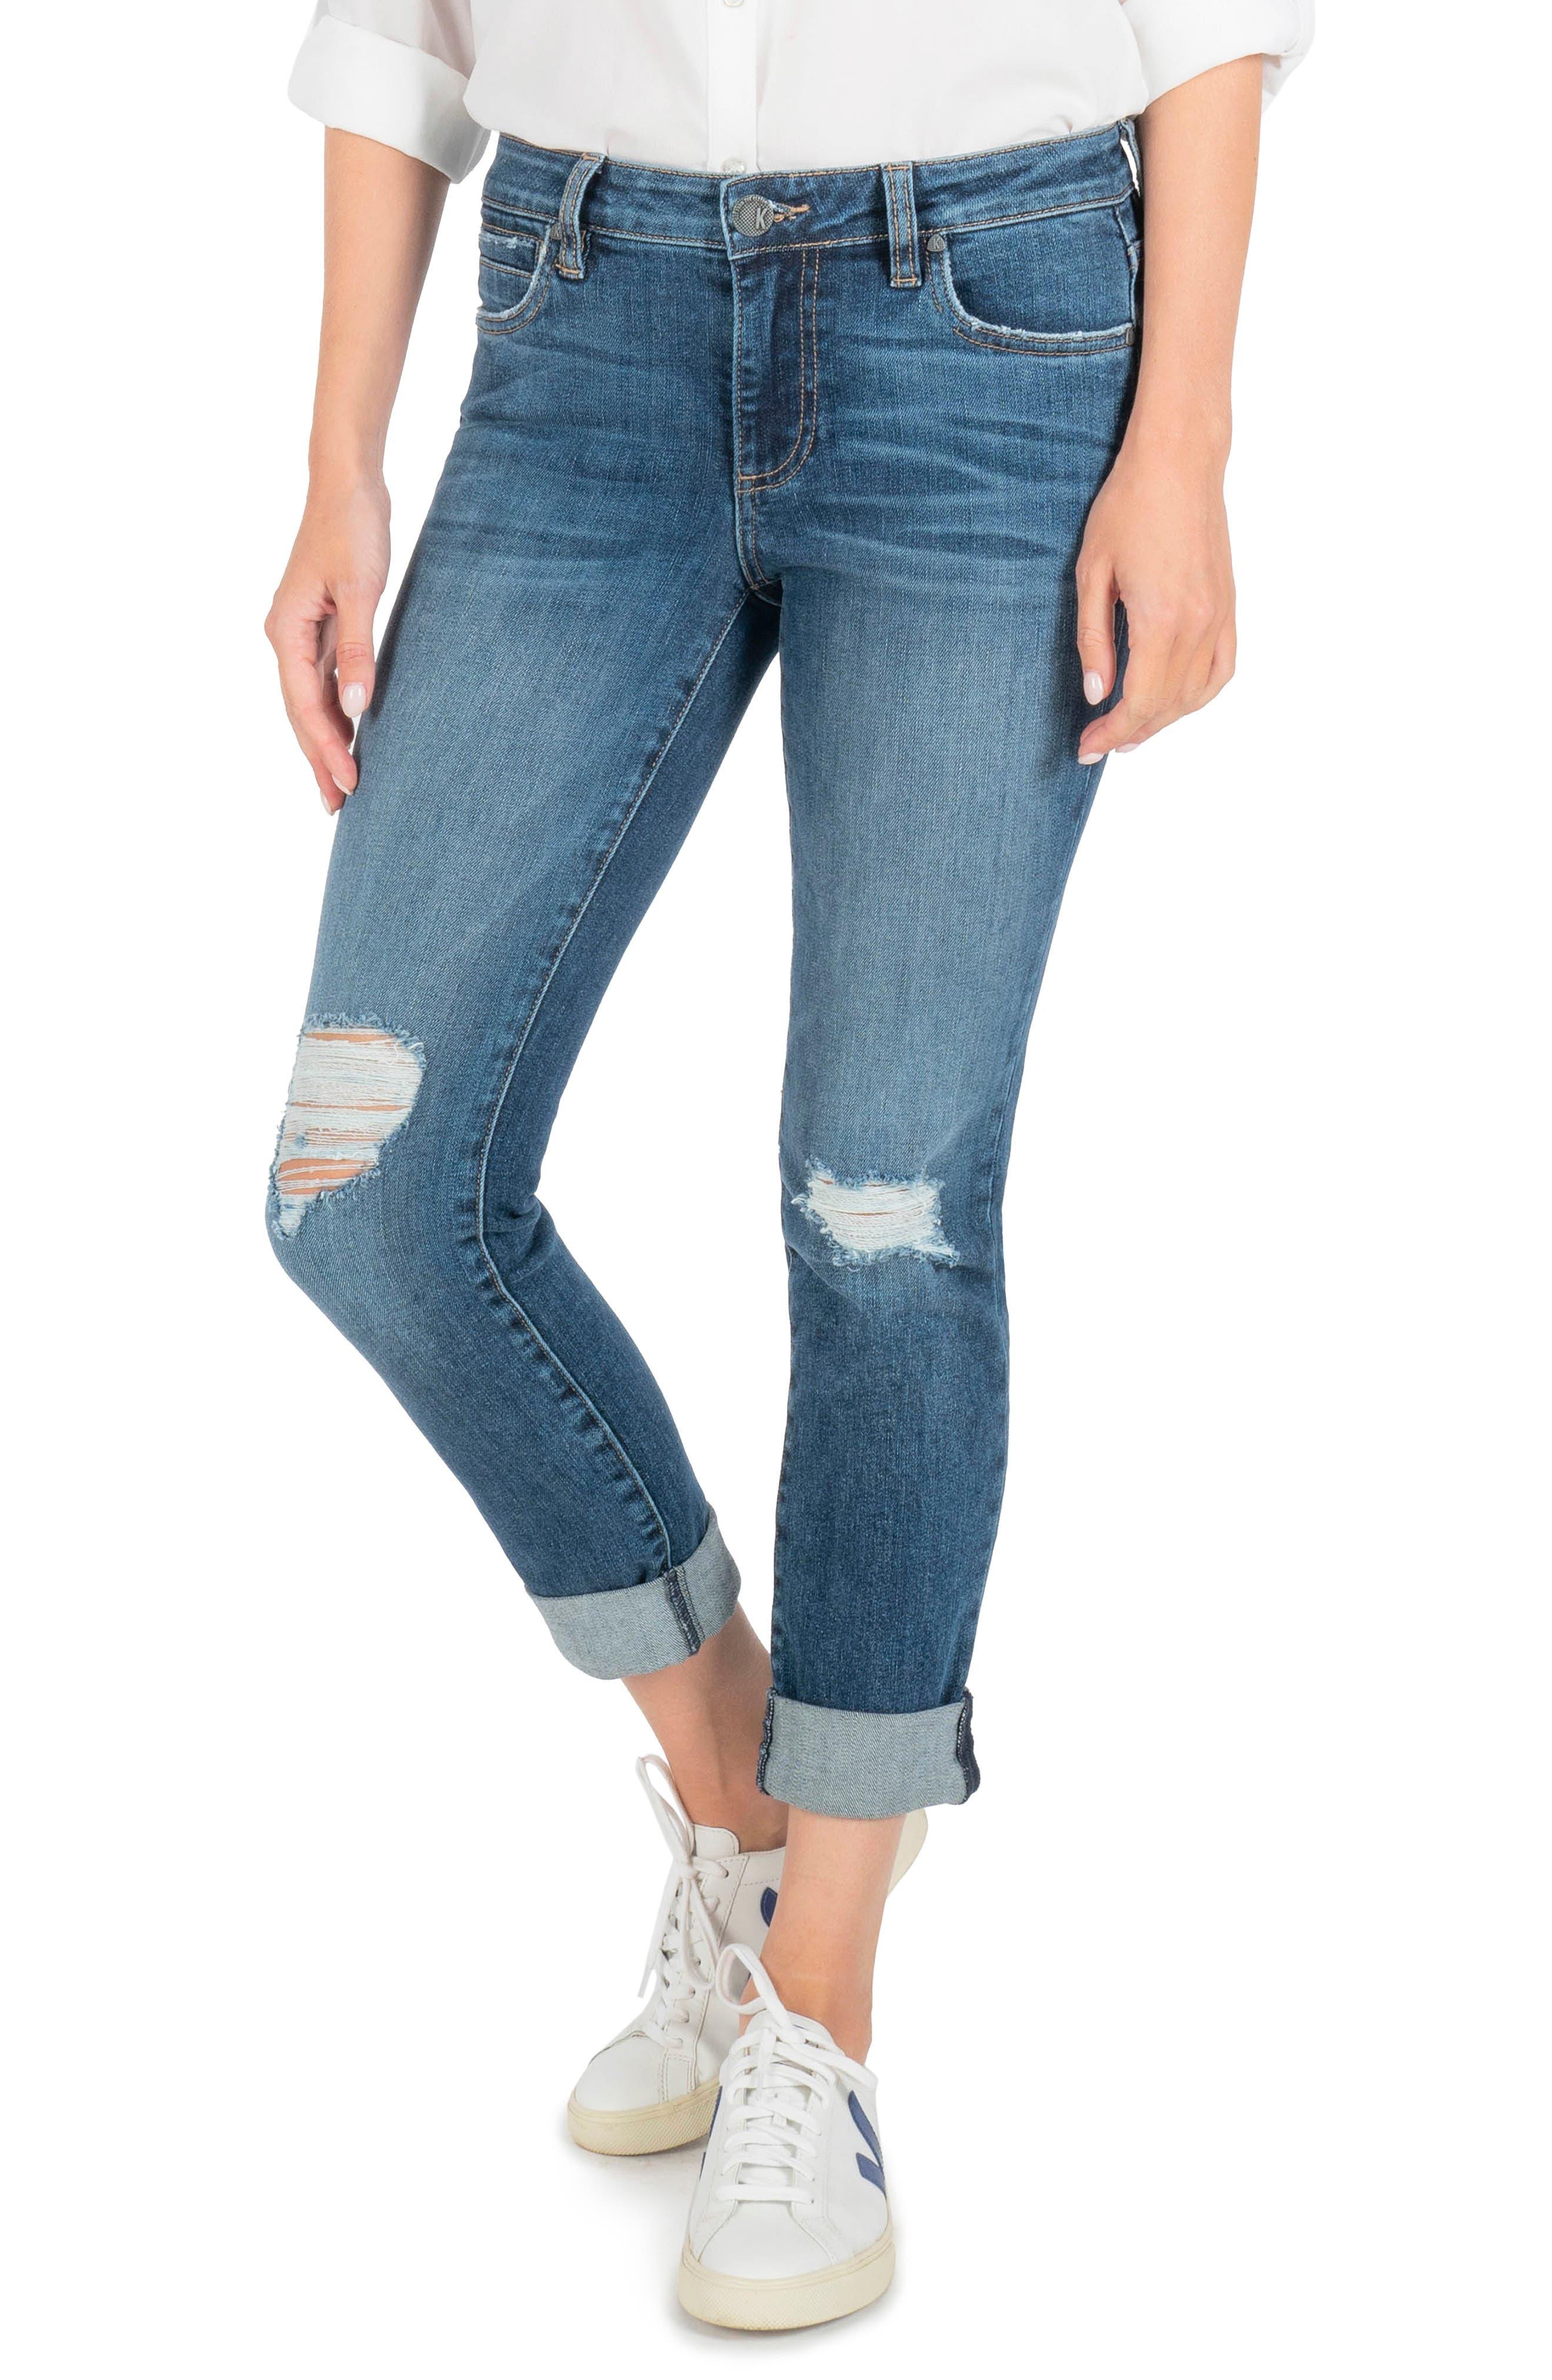 Catherine Ripped High Waist Boyfriend Jeans